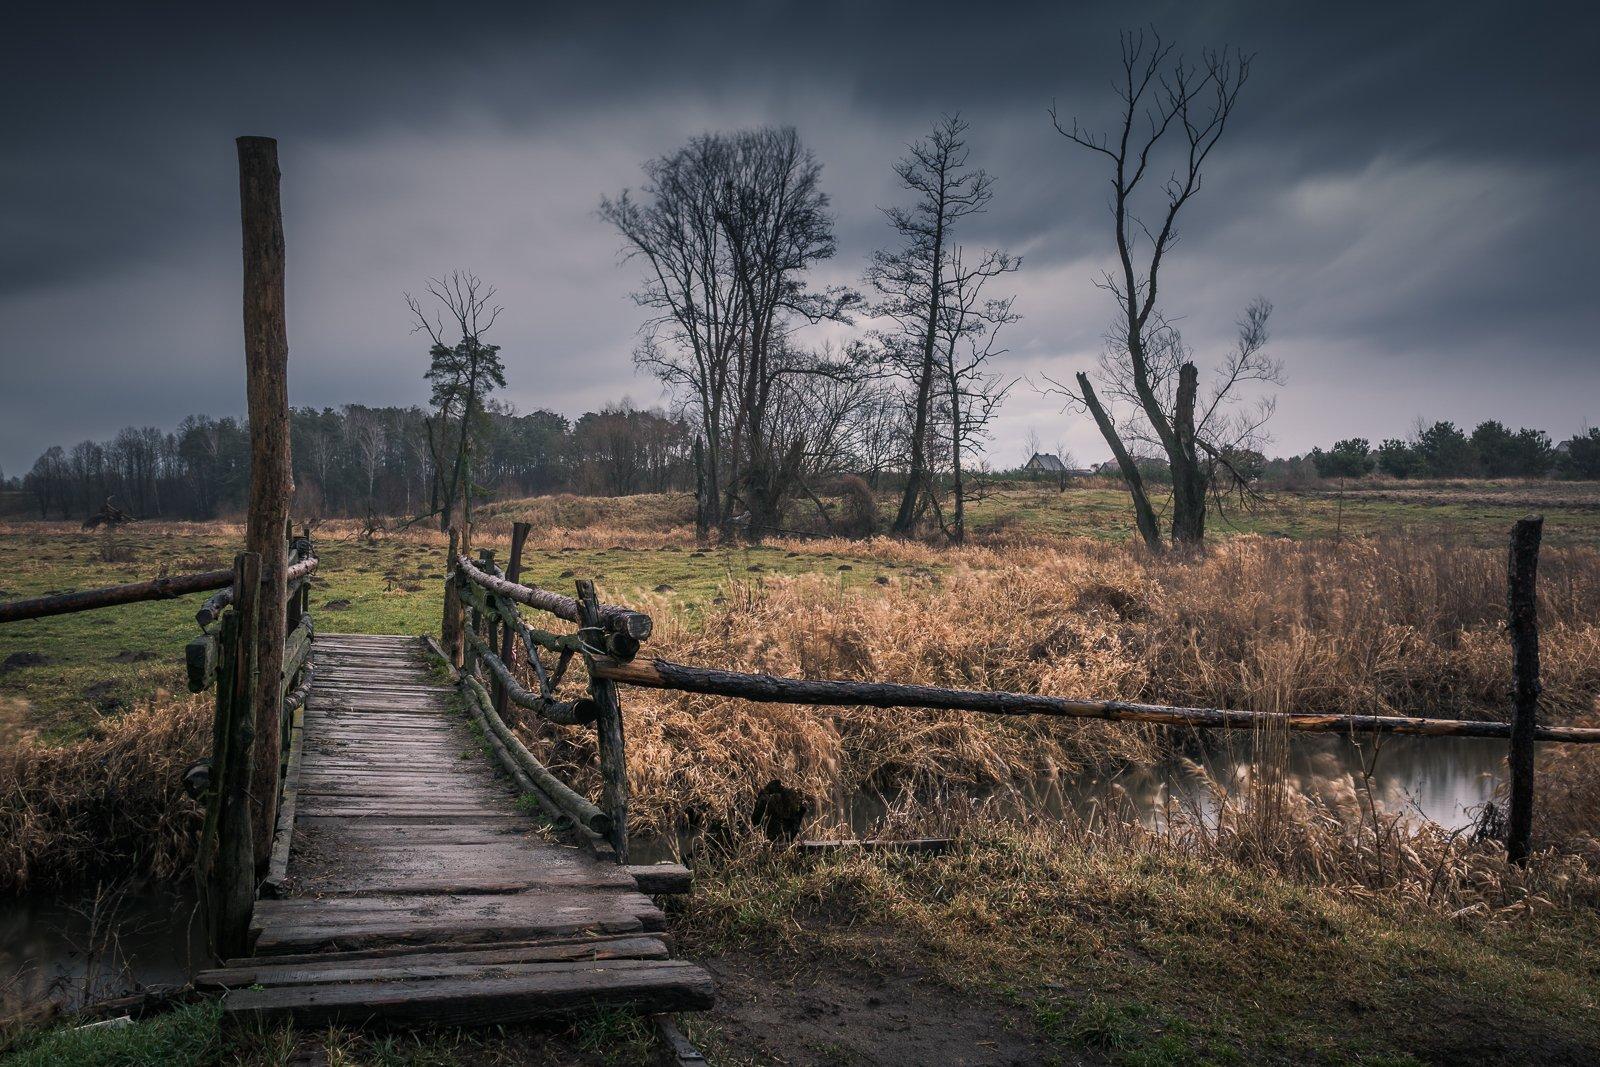 bridge, jeziorka, wooden, clouds, rain, landscape, nature, river, , Bociarski Artur